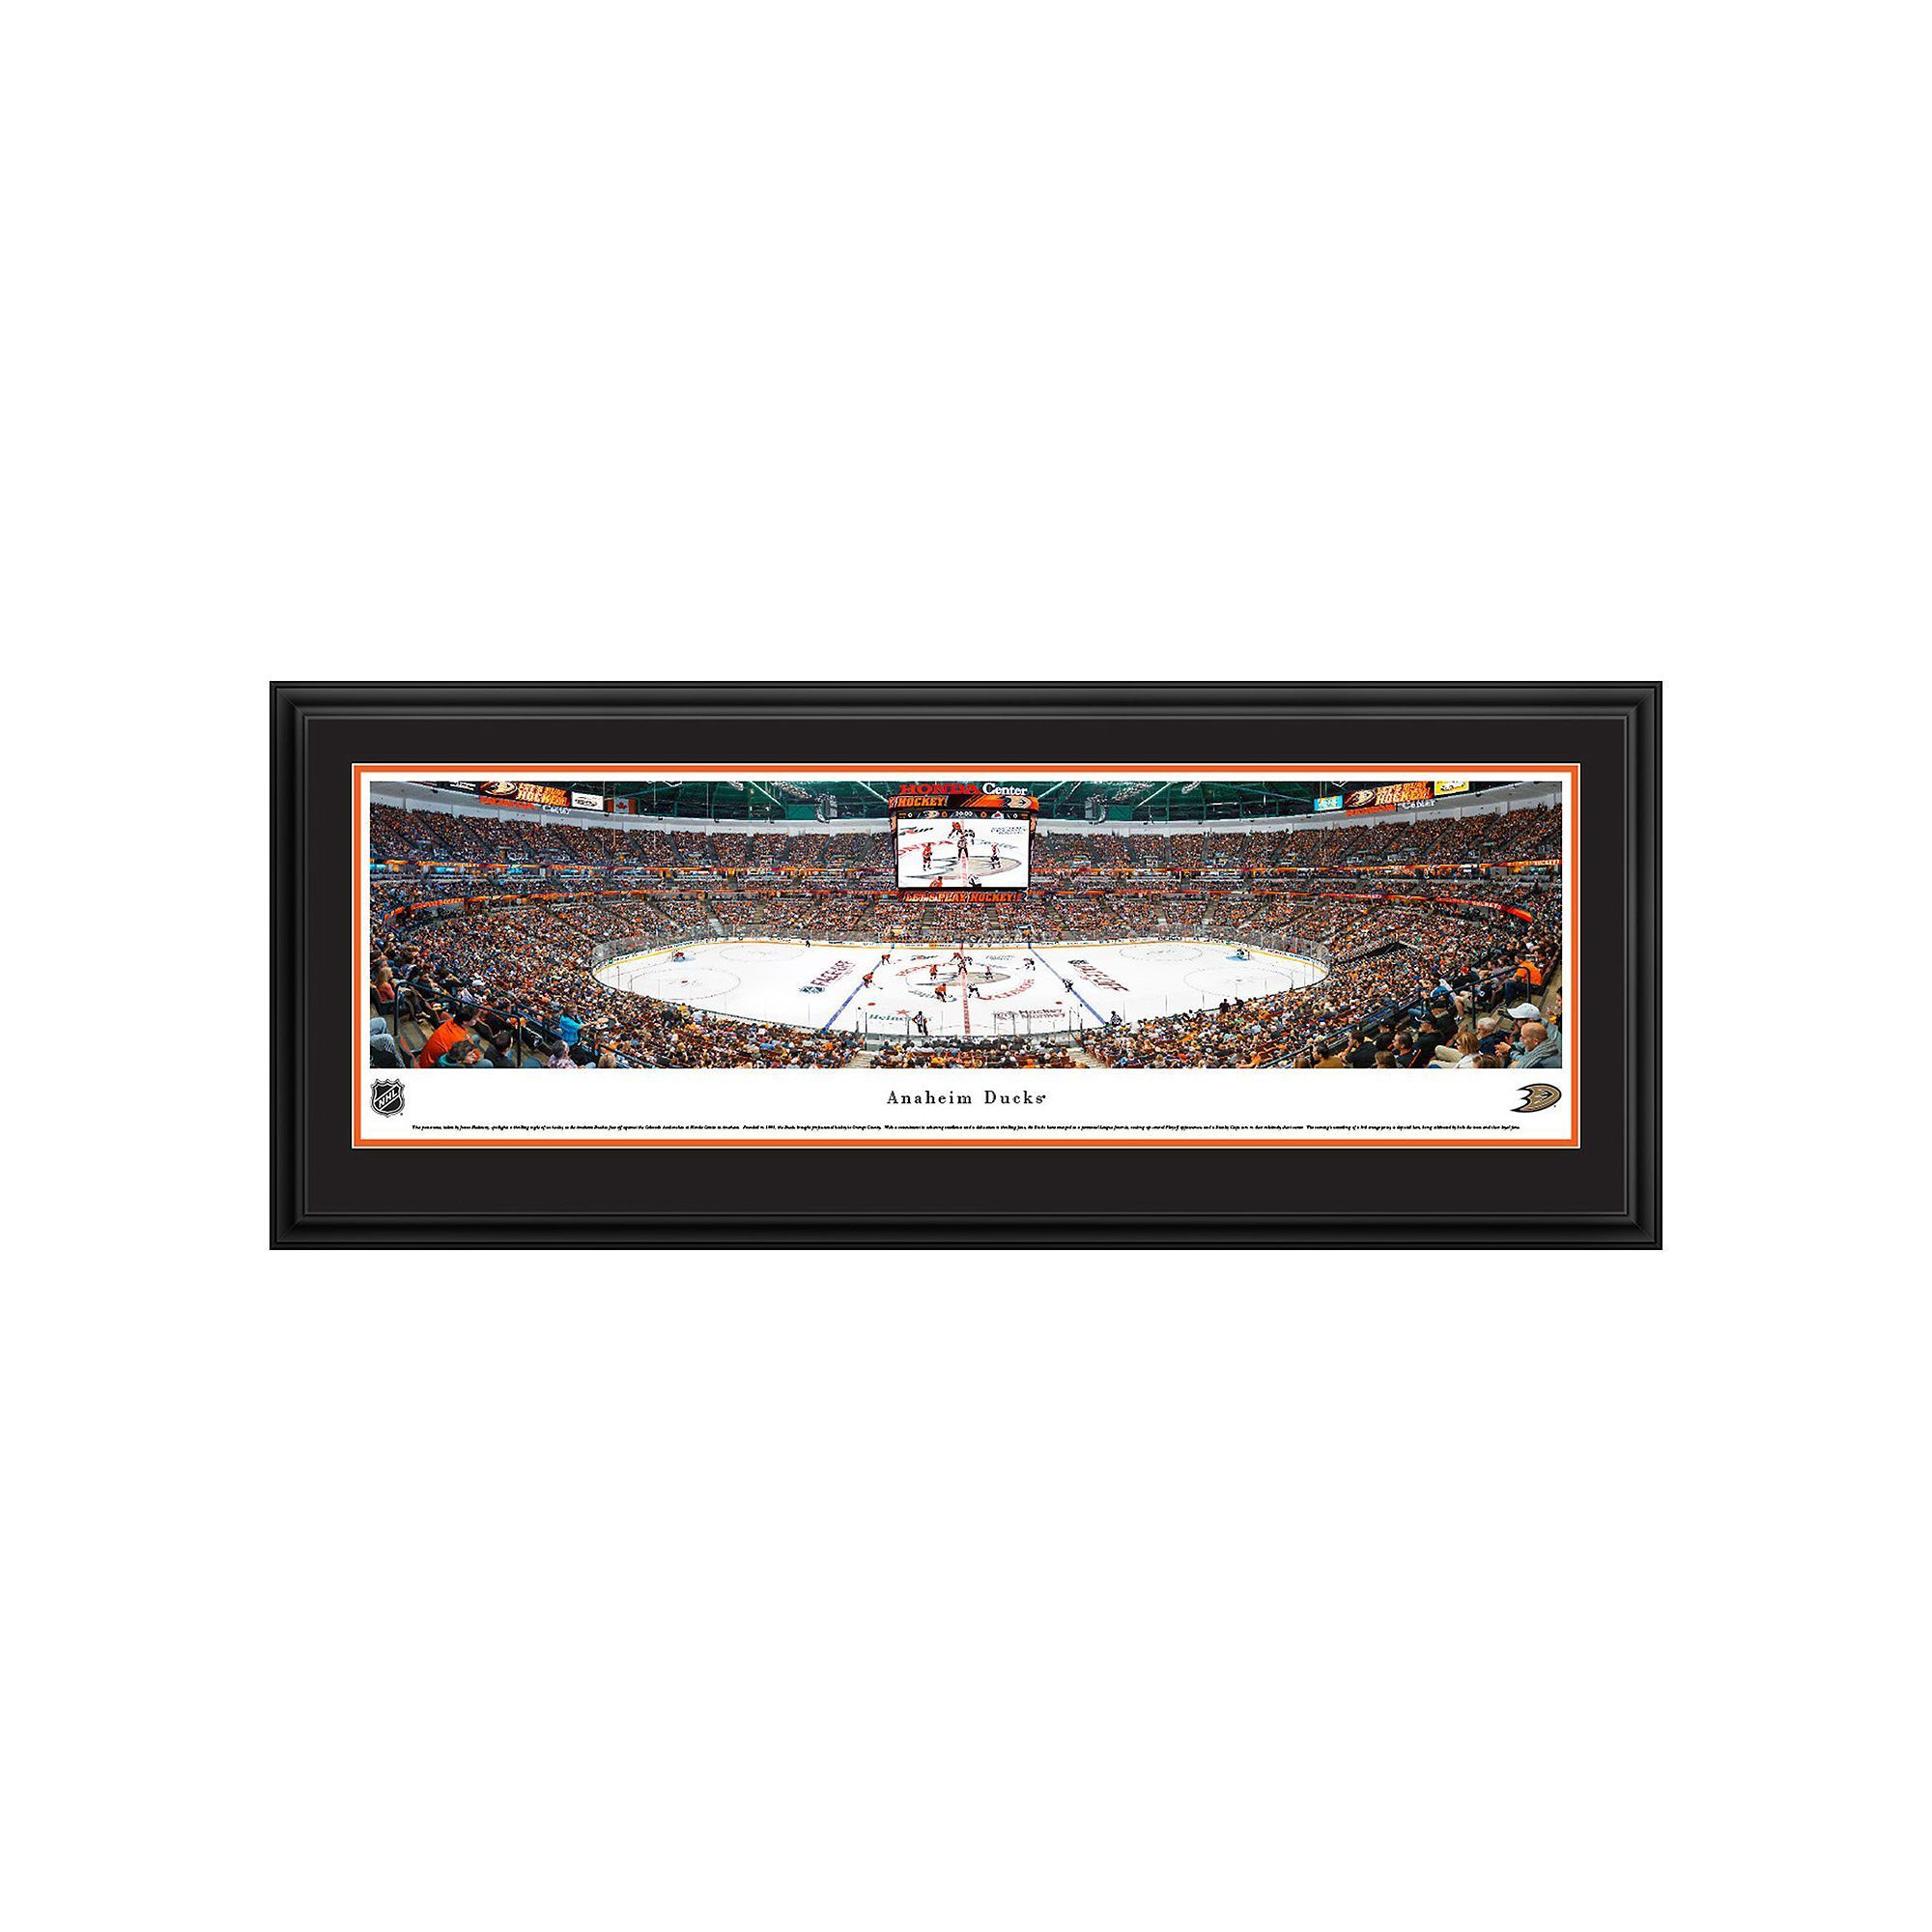 Anaheim Ducks Hockey Arena Center Ice Framed Wall Art, Multicolor